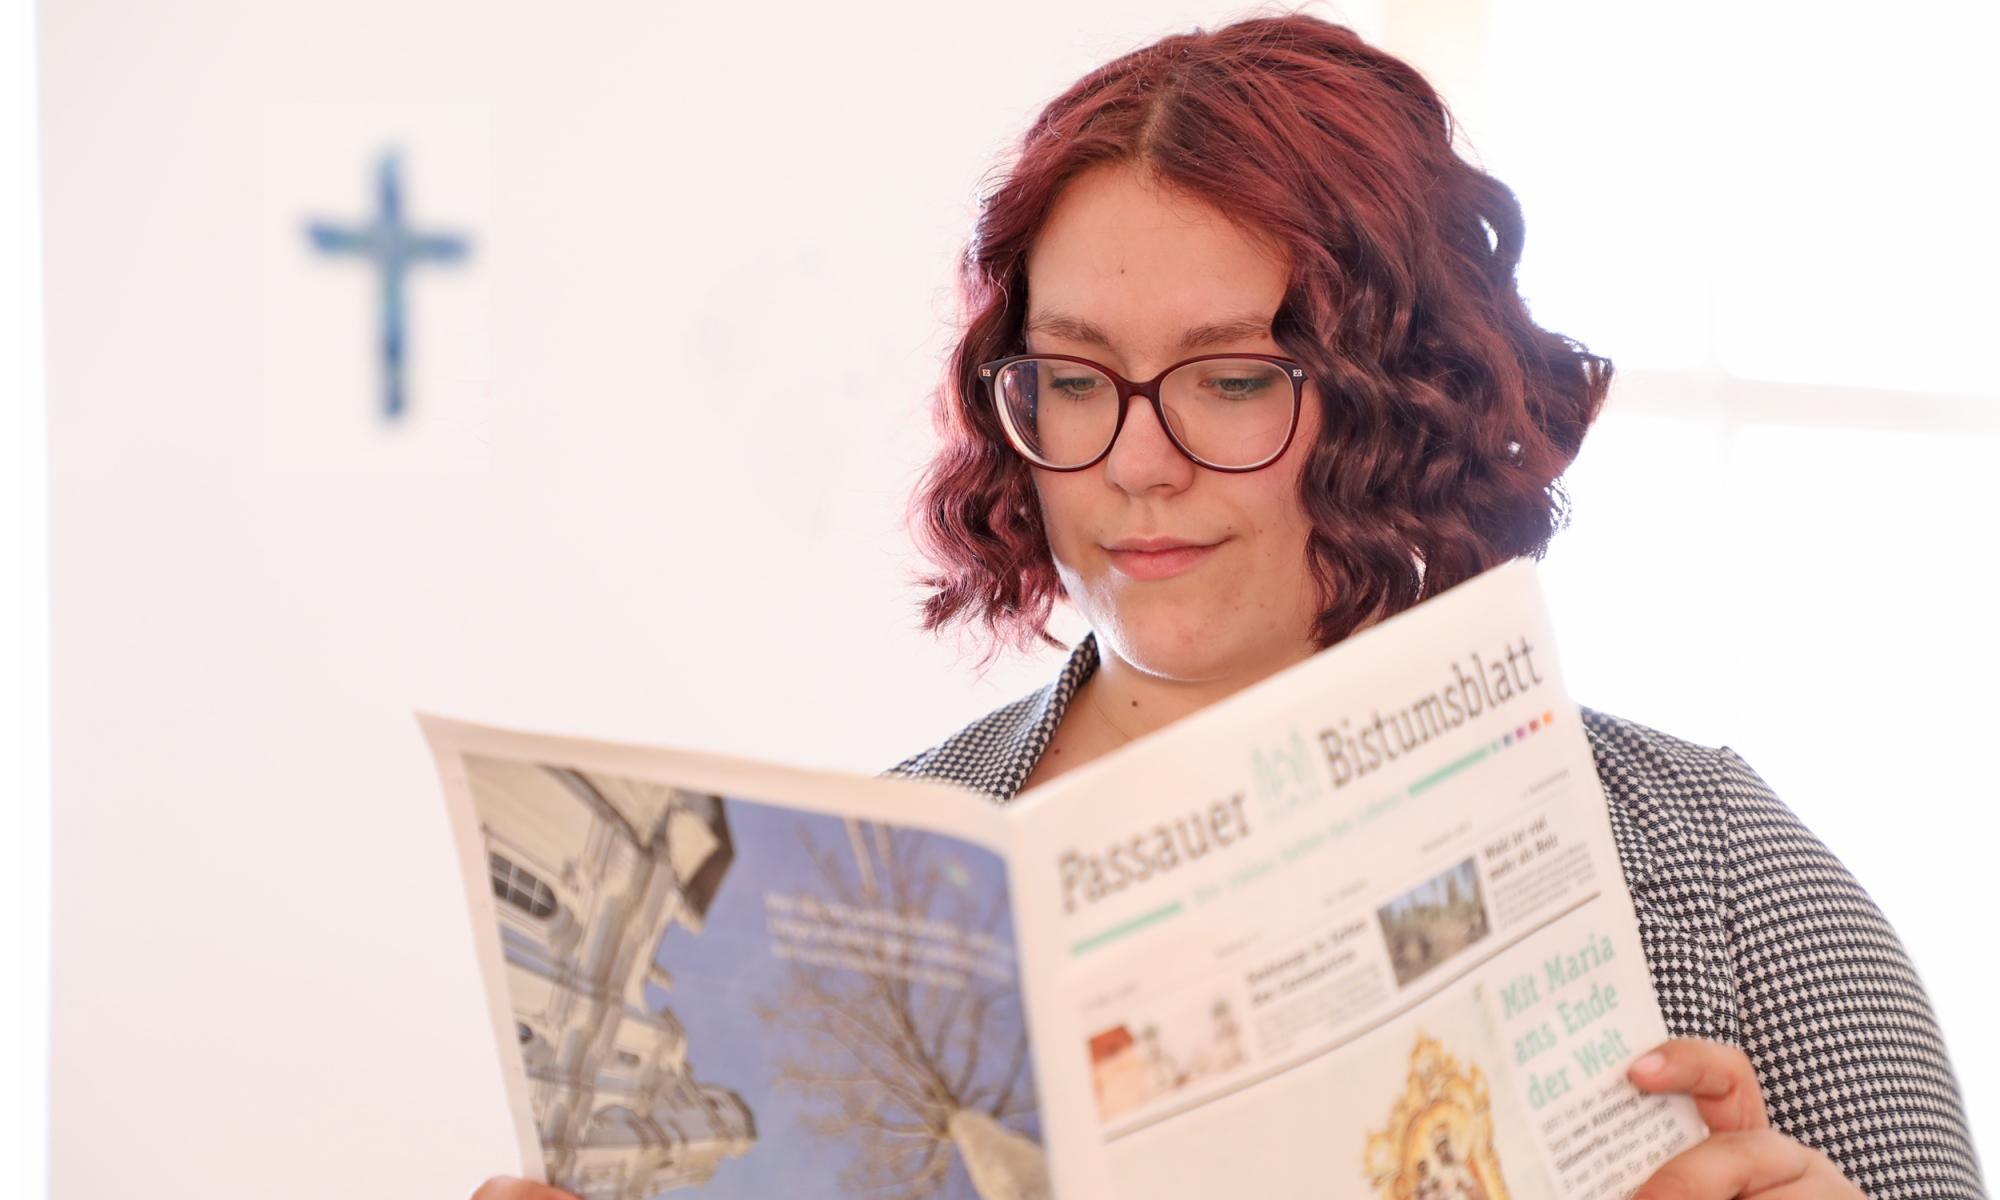 Foto Bistumsblatt Leserin